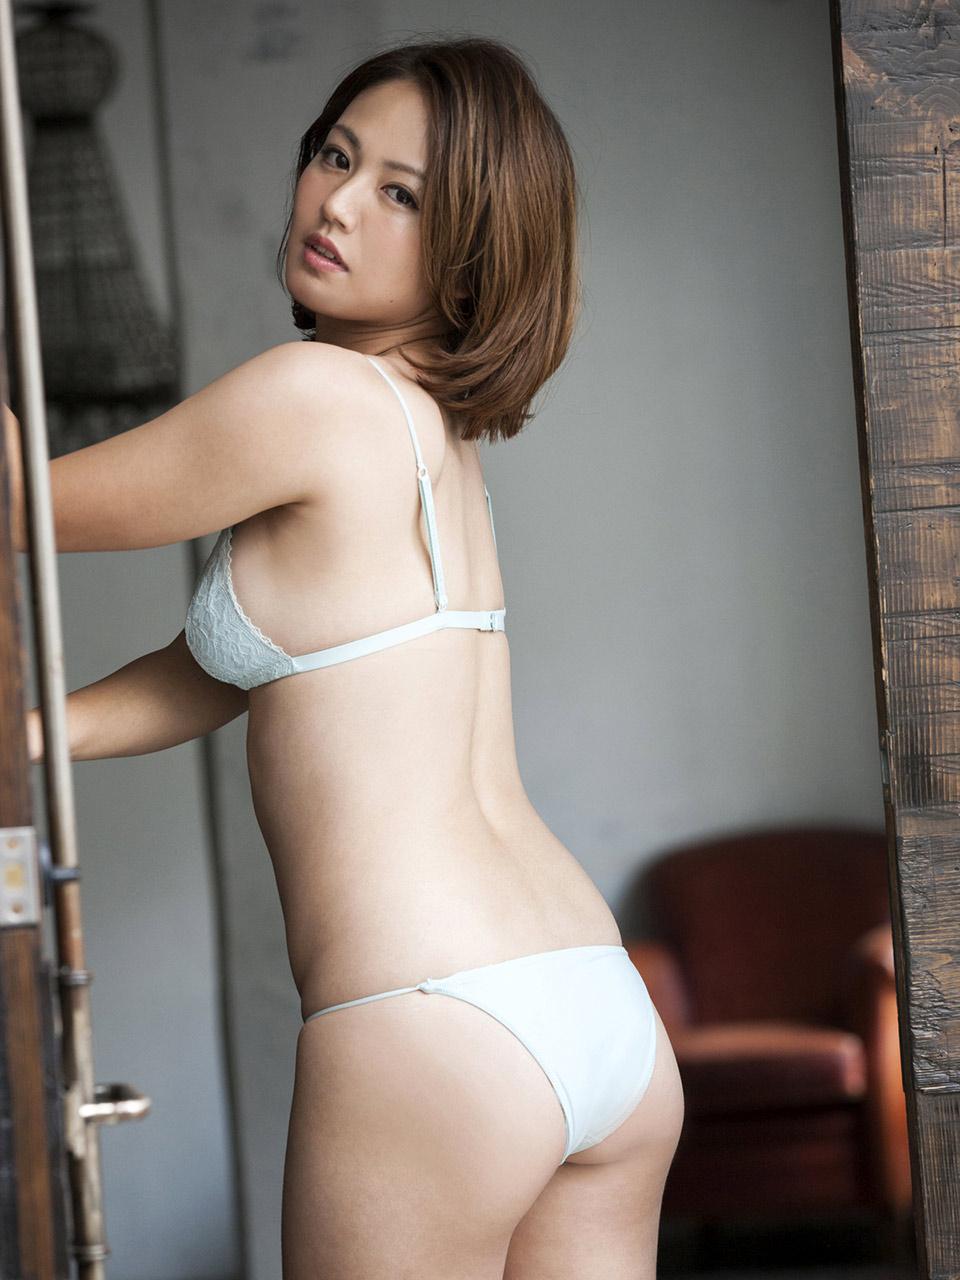 She www.fuck japanese.com